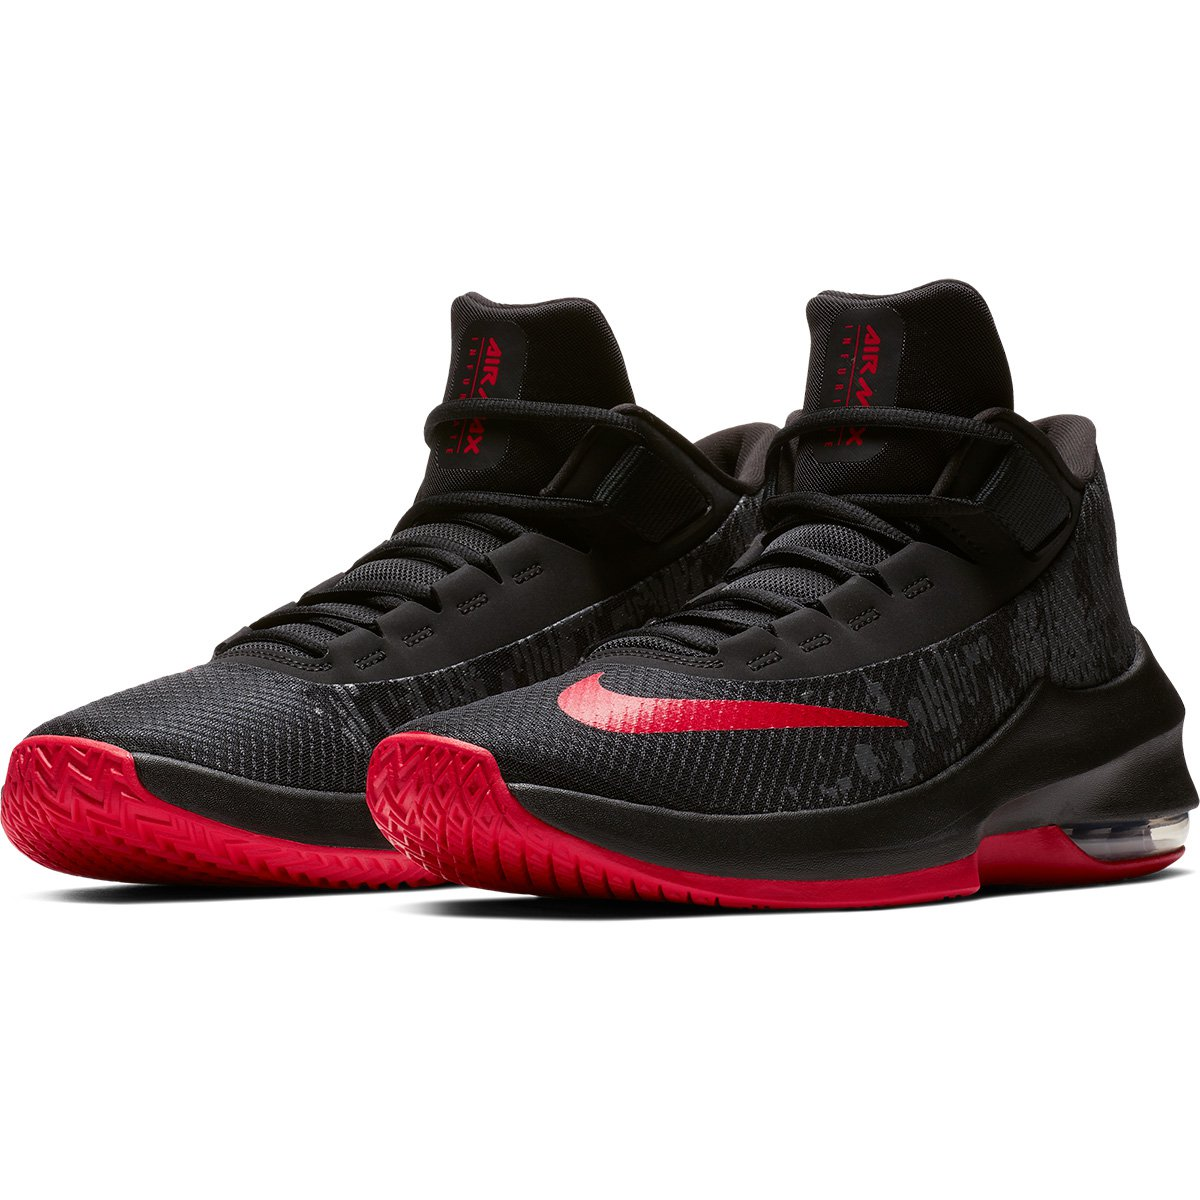 1eba832f651ed Tênis Nike Air Max Infuriate 2 Mid Masculino - Preto e Vermelho - Compre  Agora